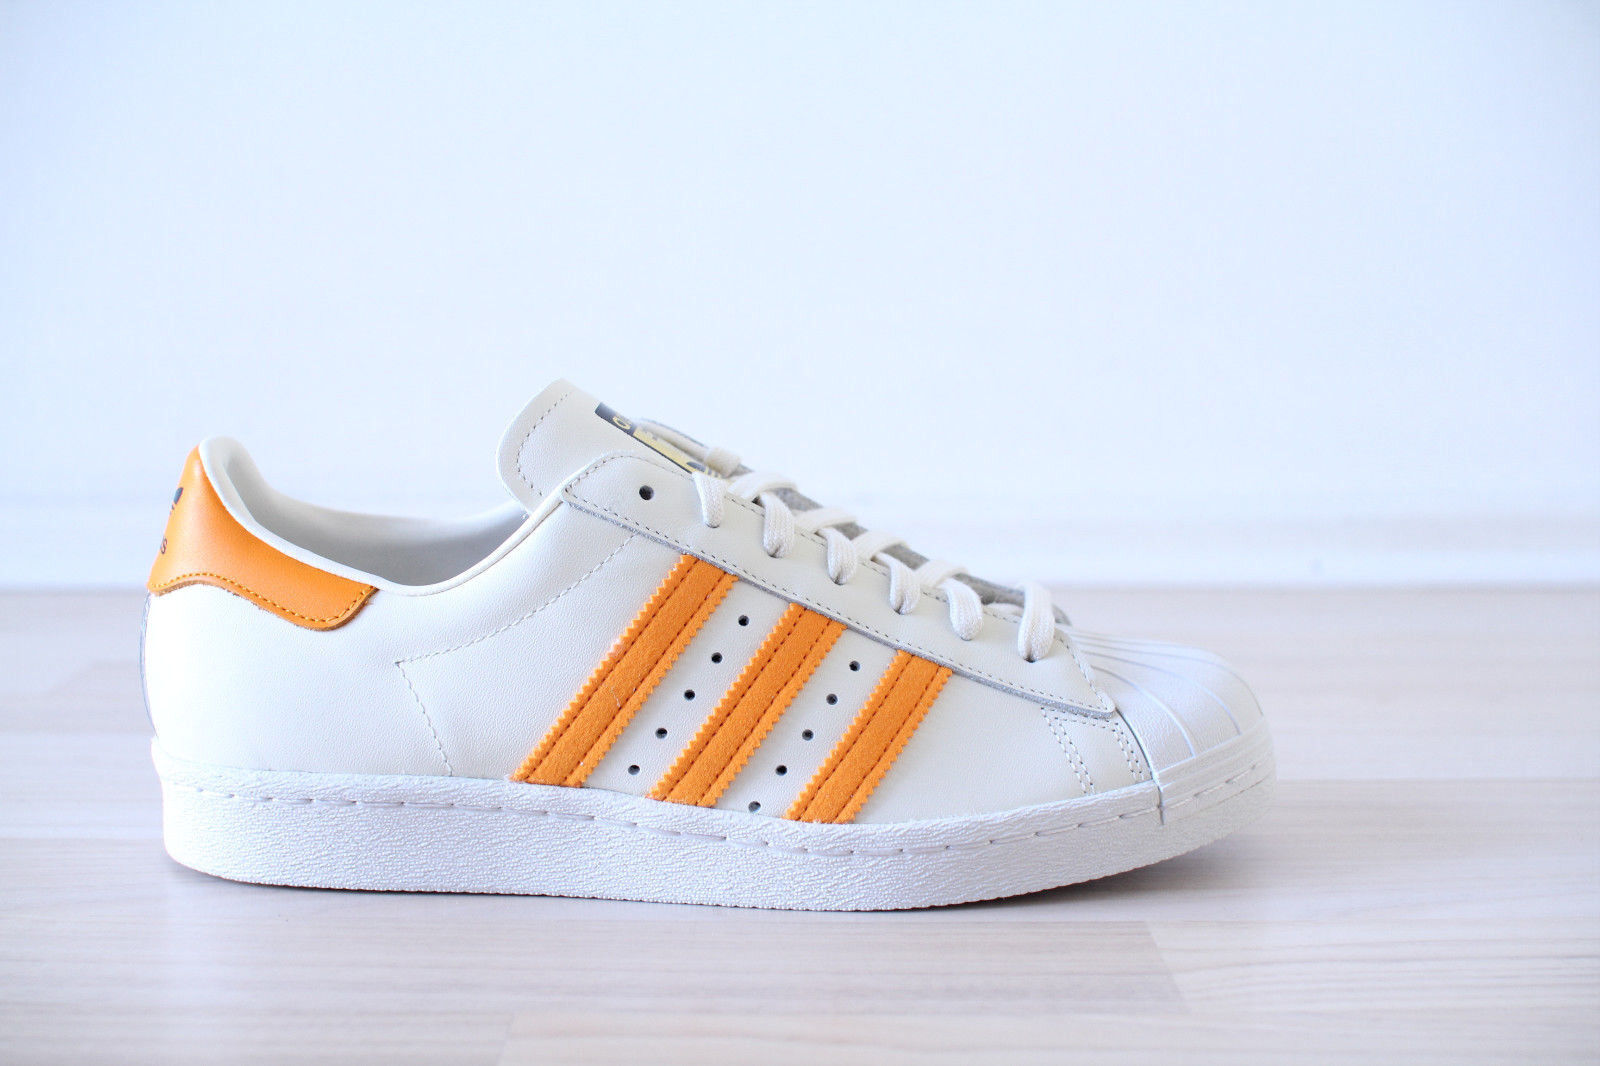 Adidas Superstar 80s beige naranja cuero talla 40,41,42,43,44,45,46 nuevo & OVP